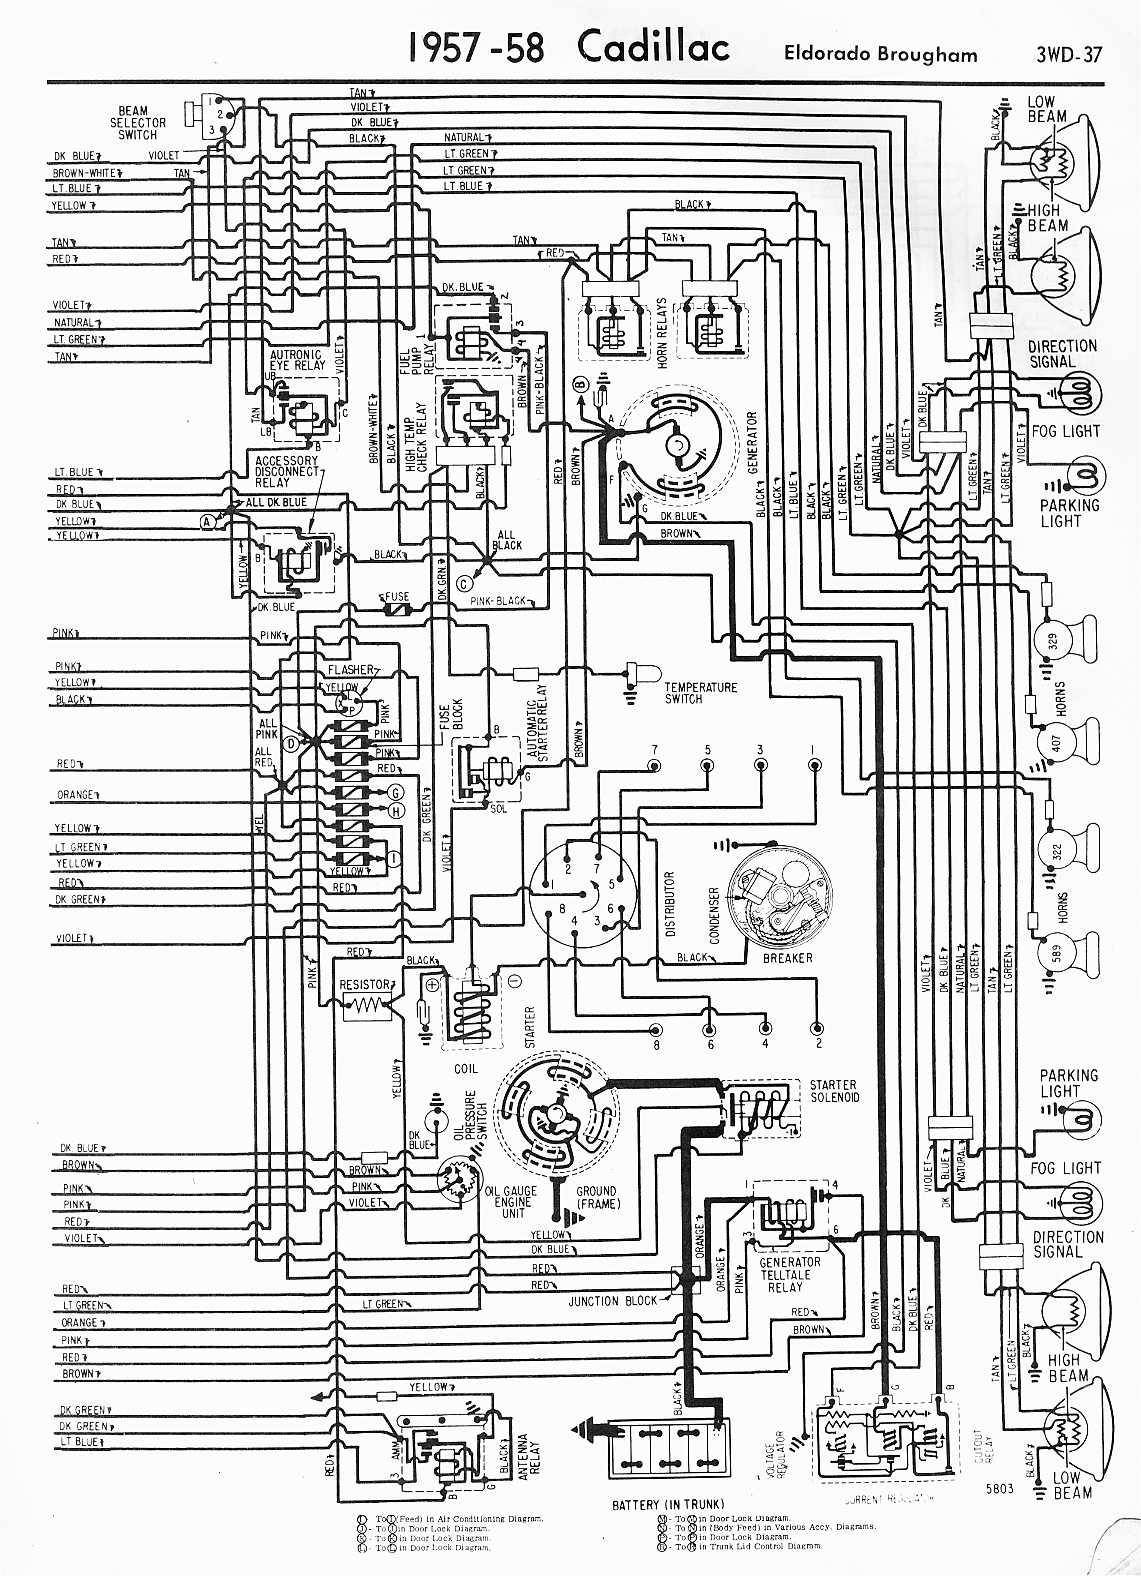 Cadillac Lights Wiring Diagram : Cadillac seville sts wiring diagrams